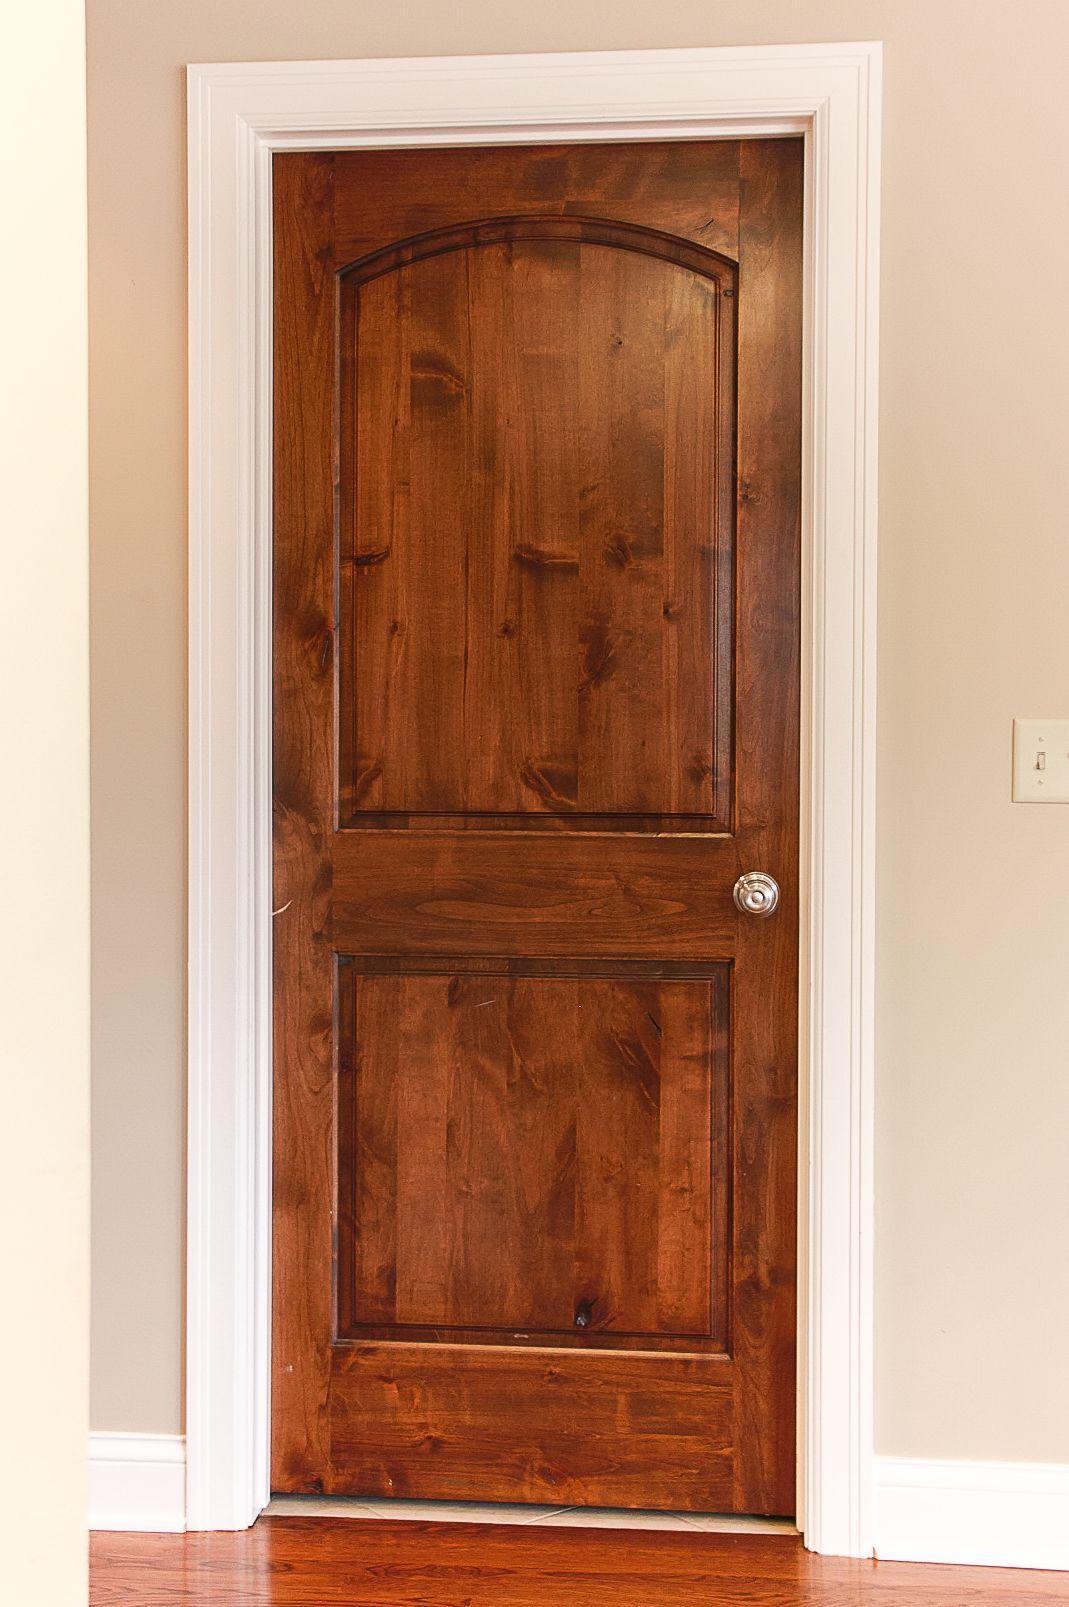 White trim and Wood doors. Custom stained Alder Doors. | Interior ...